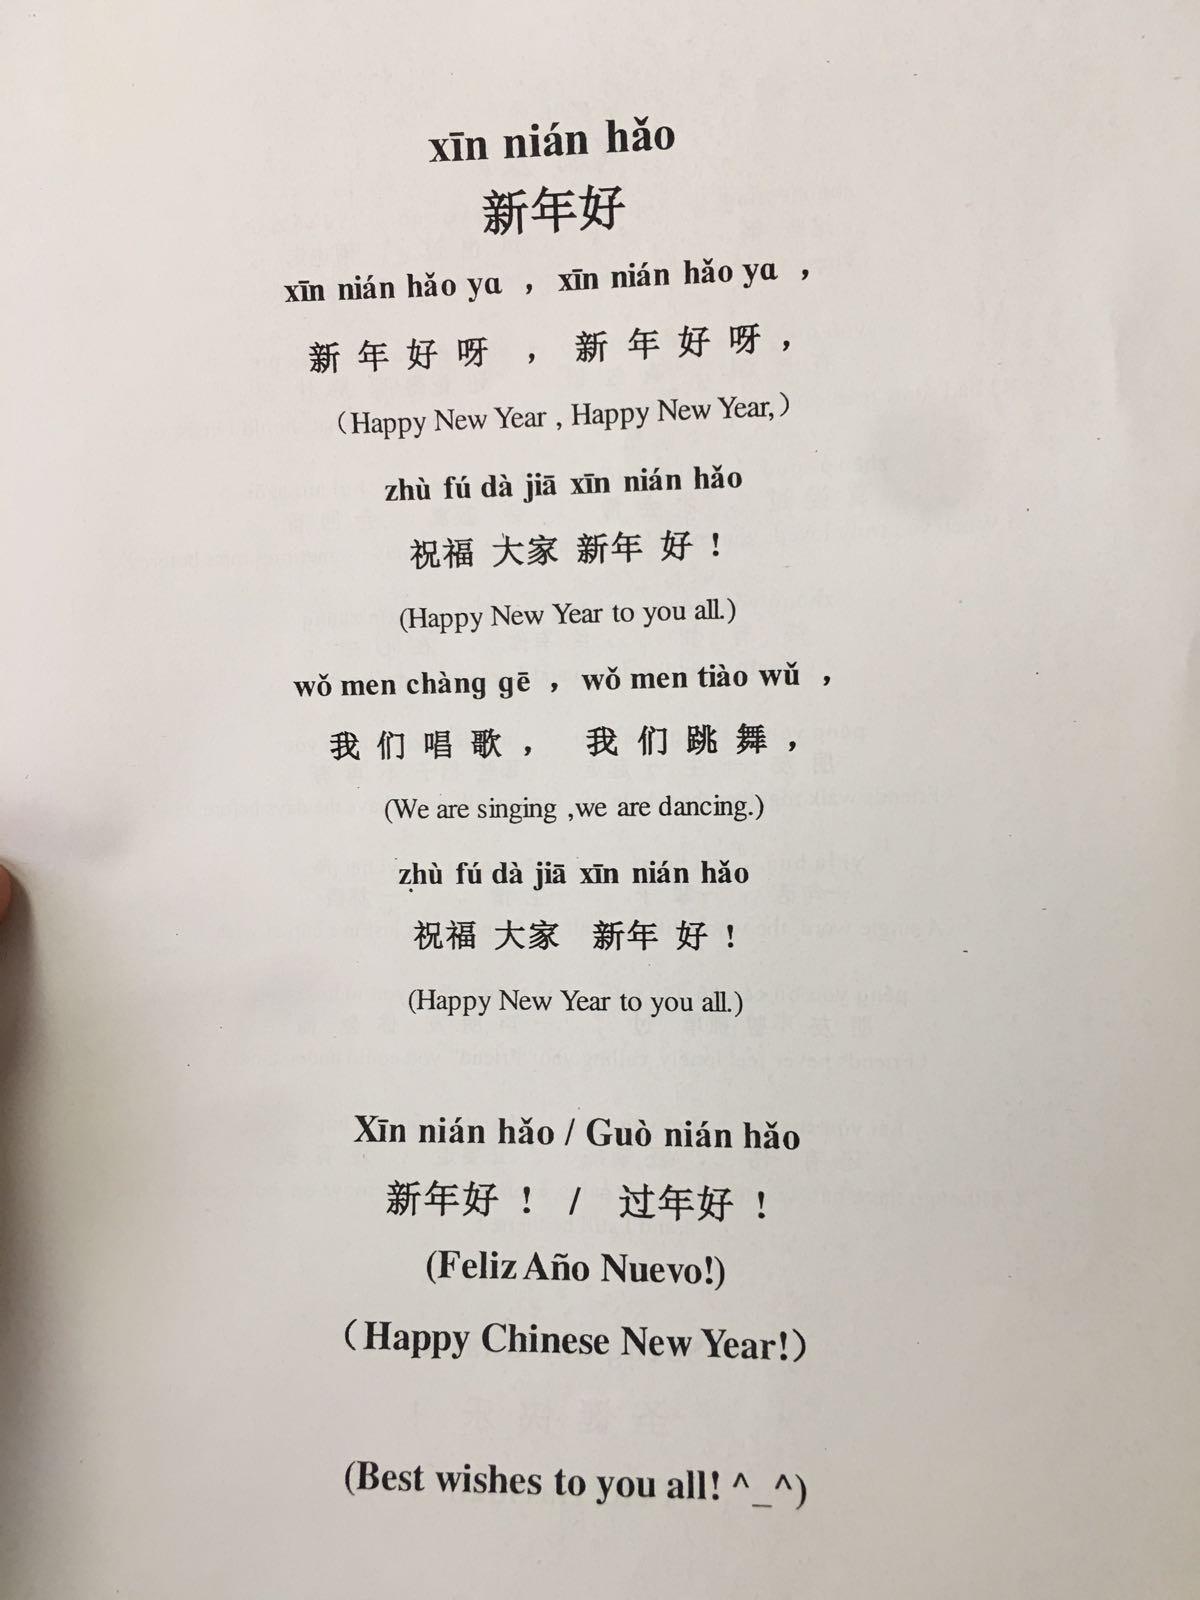 Lengua y Cultura china 2